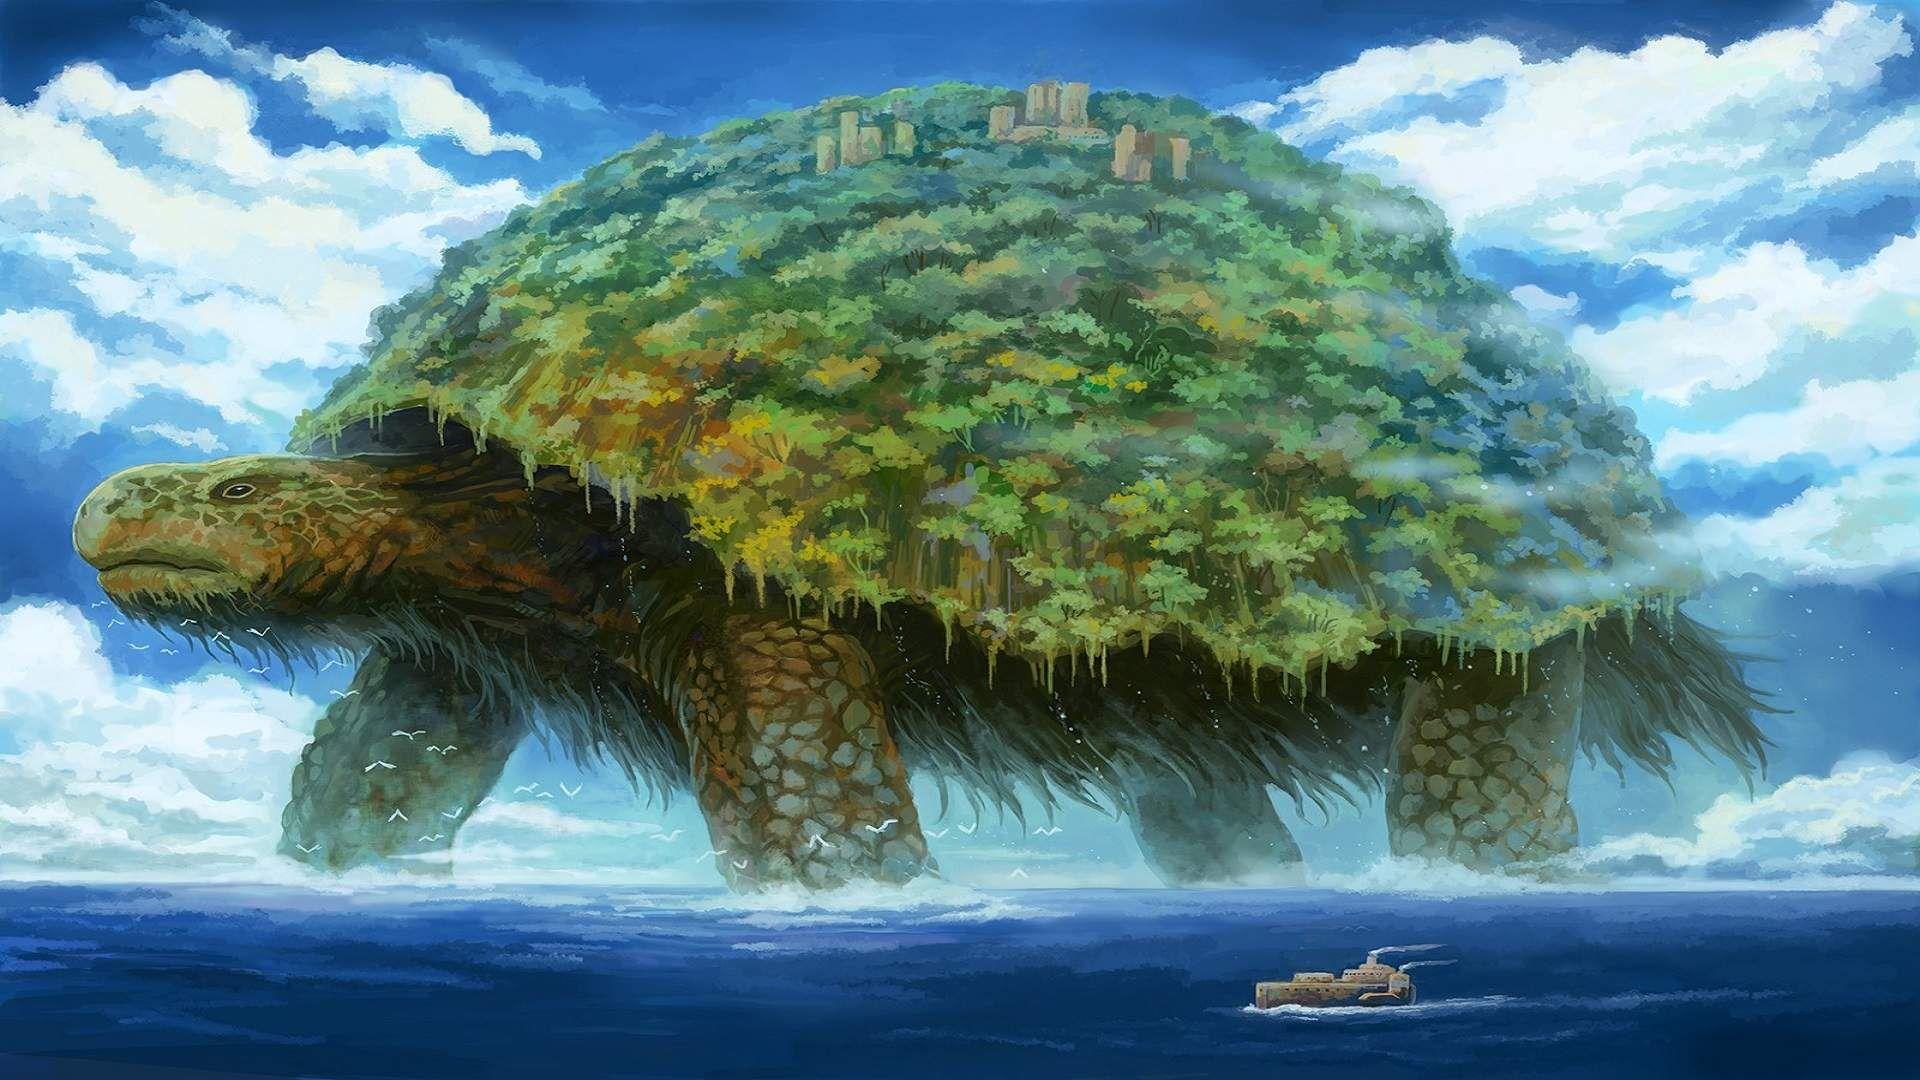 Giant Turtle Island Fantasy Art